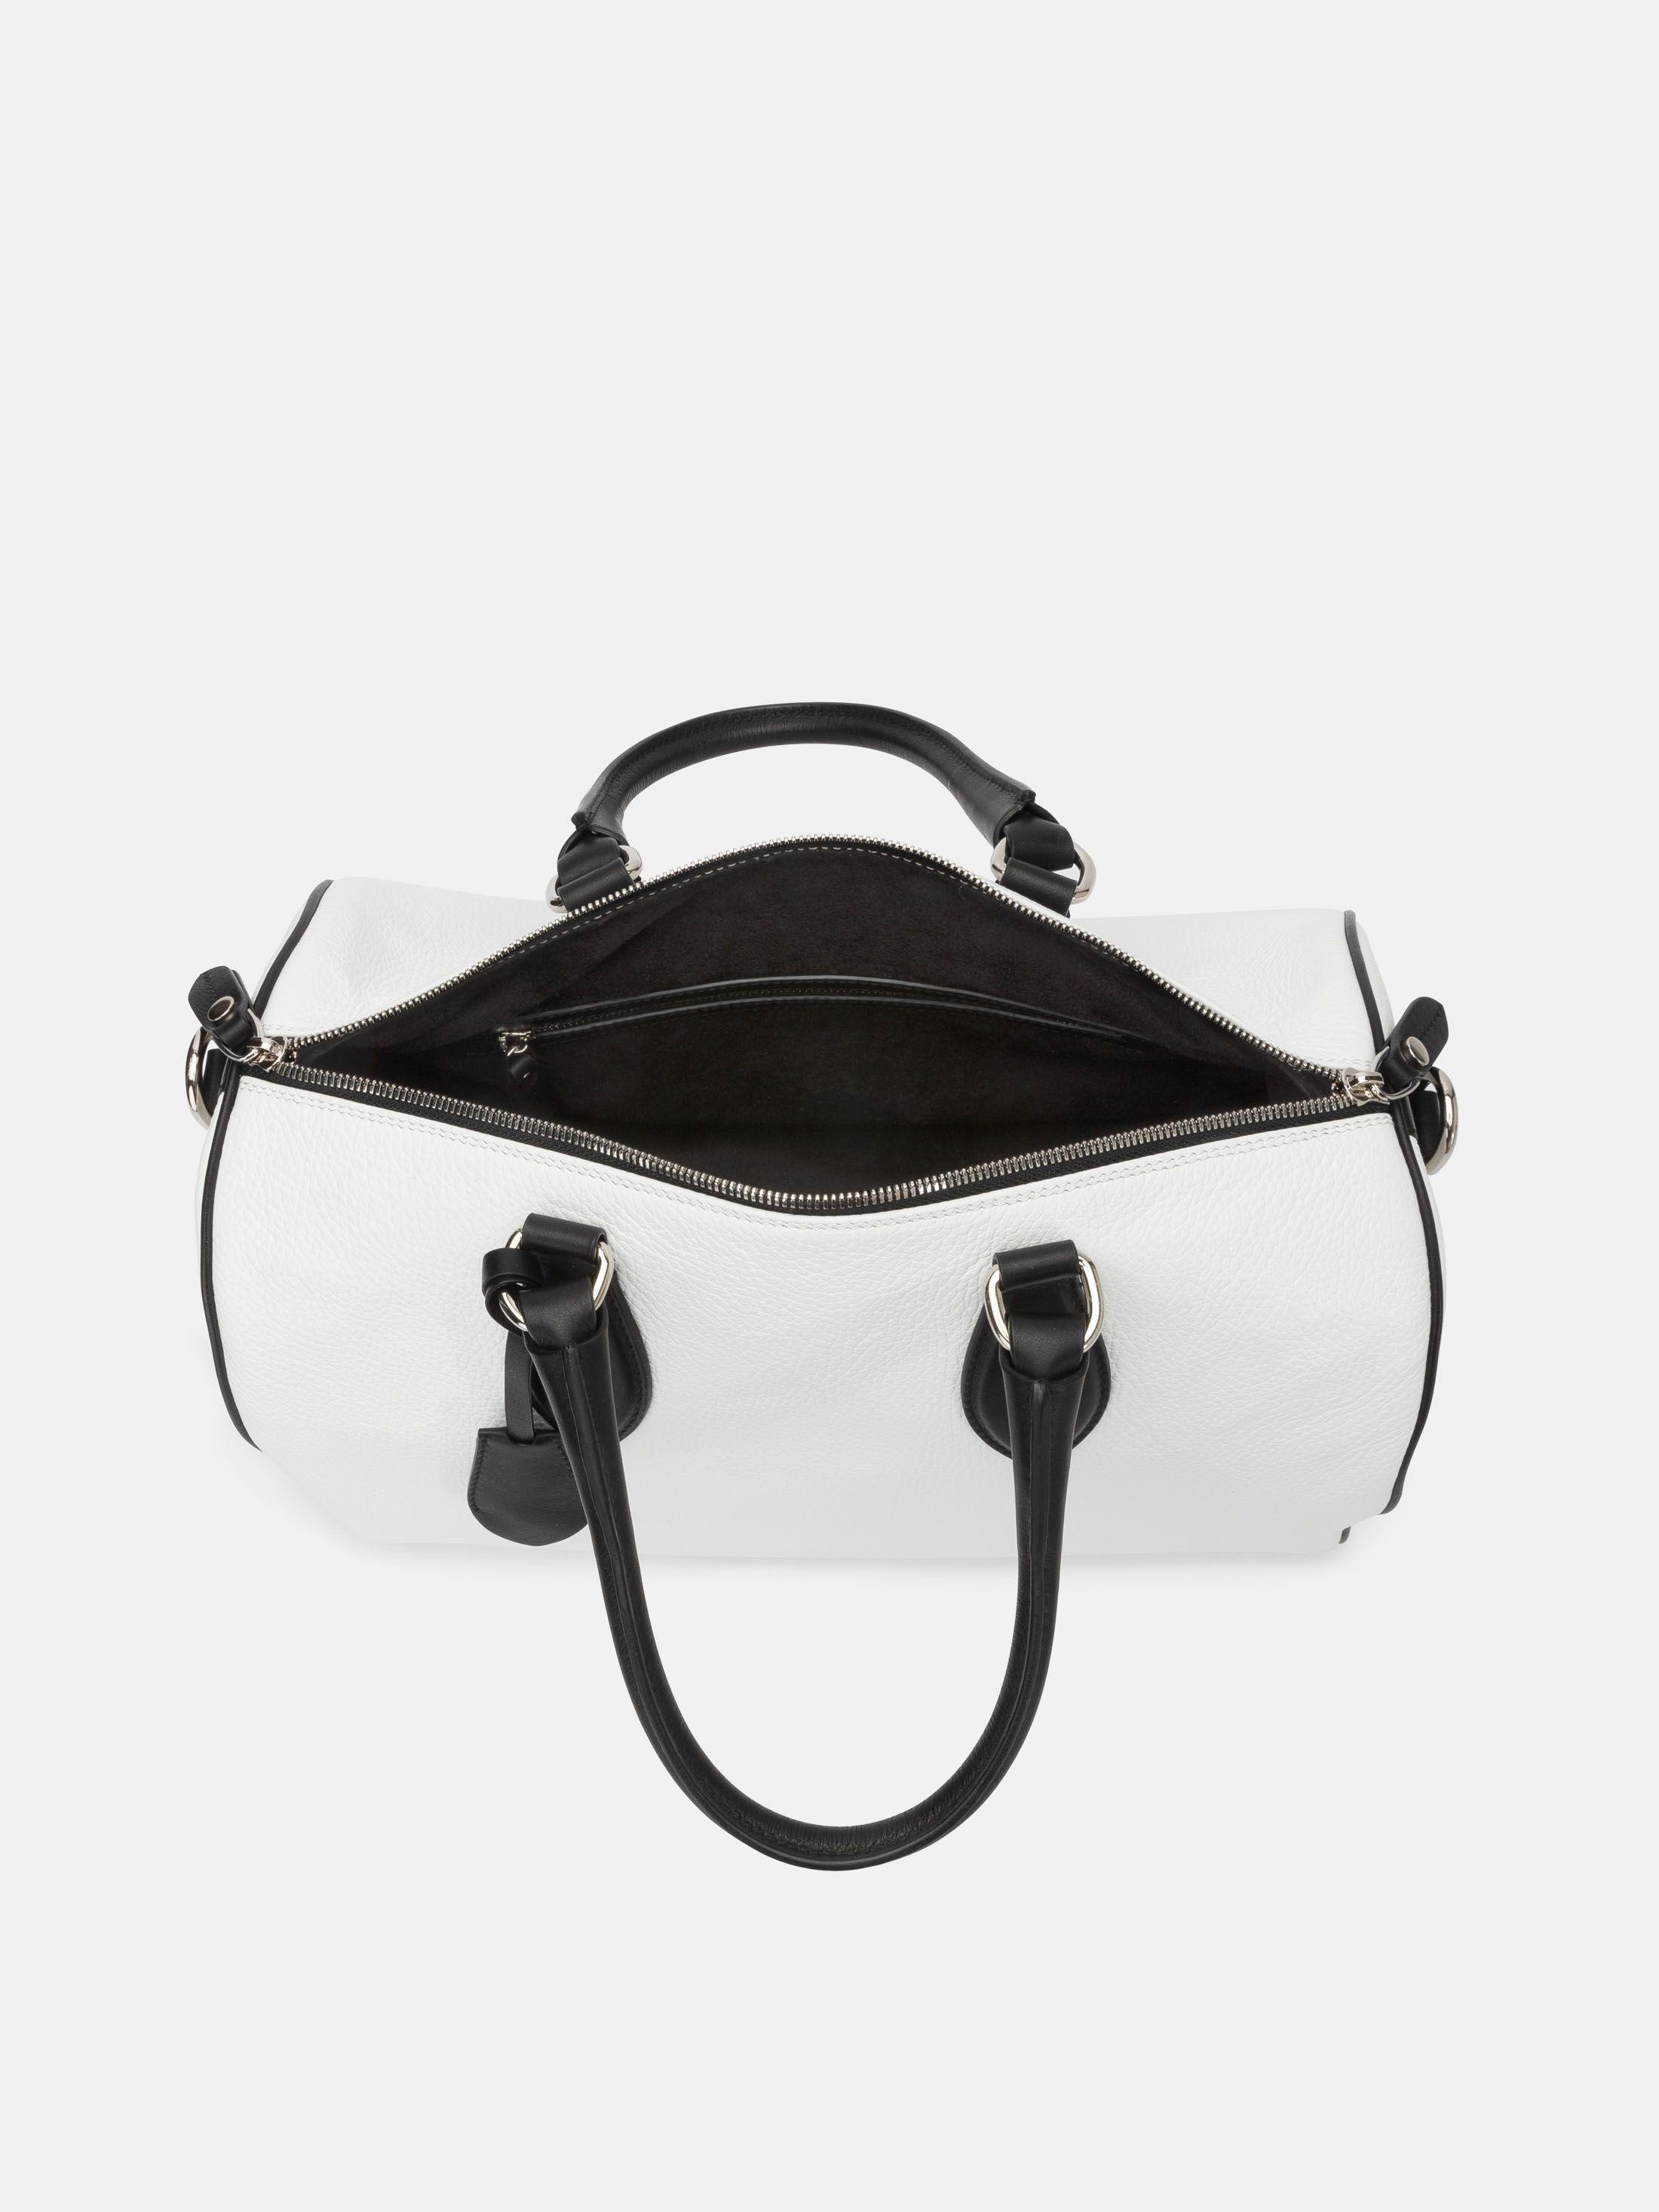 custom duffle bag design nz